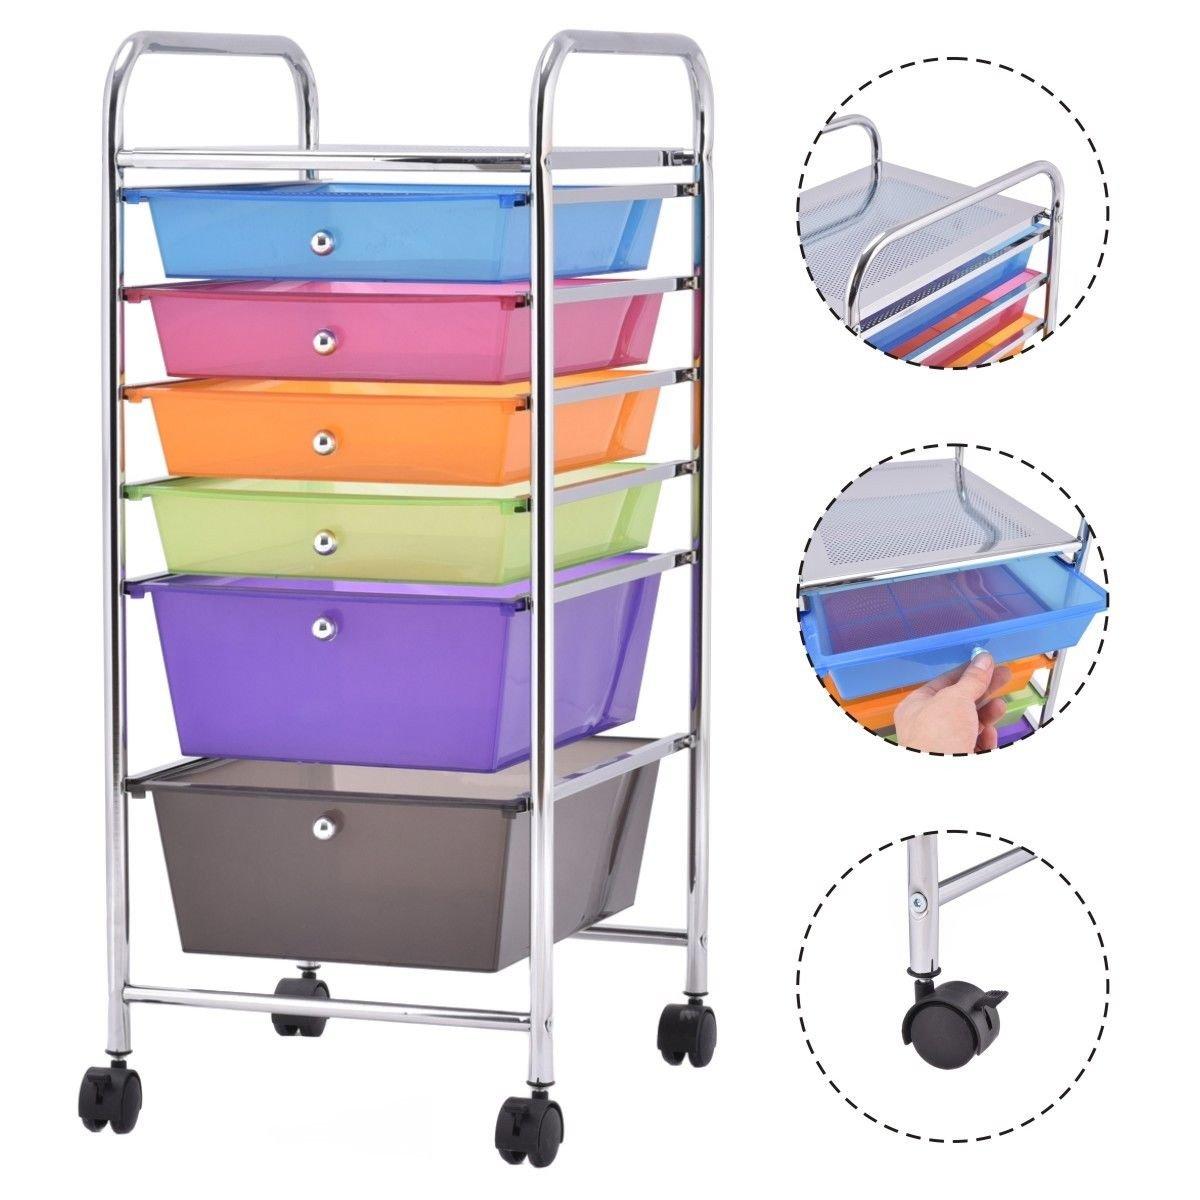 onestops8 6 Drawer Rolling Storage Cart Tools Scrapbook Paper Office School Organizer New